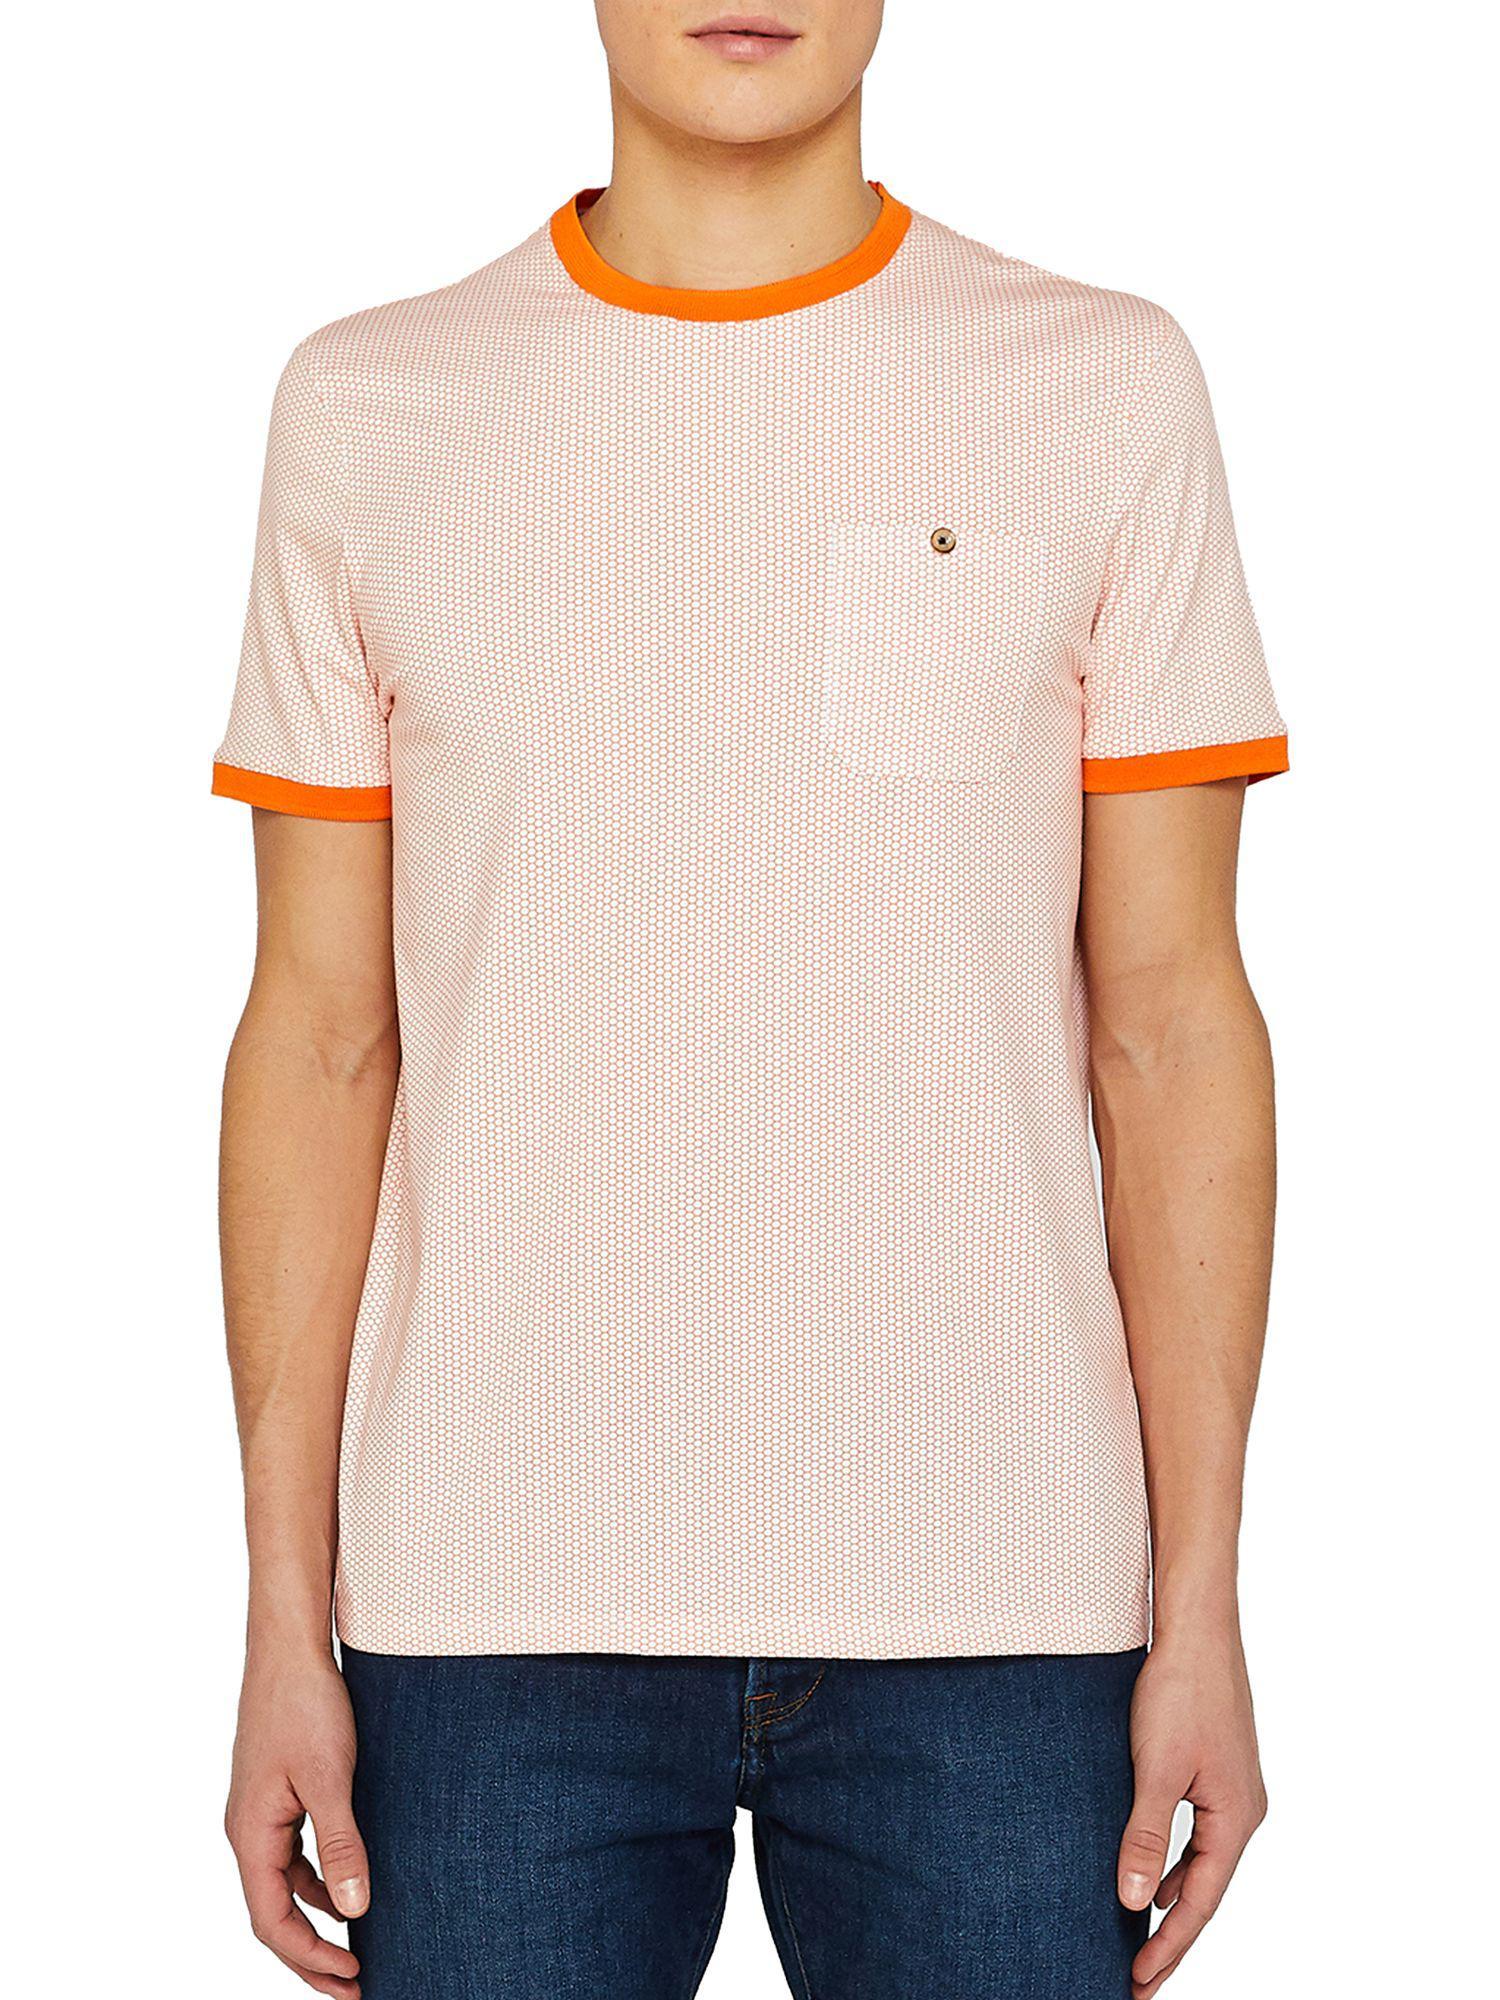 0a7186ec Ted Baker Colla Short Sleeve Printed T-shirt in Orange for Men - Lyst